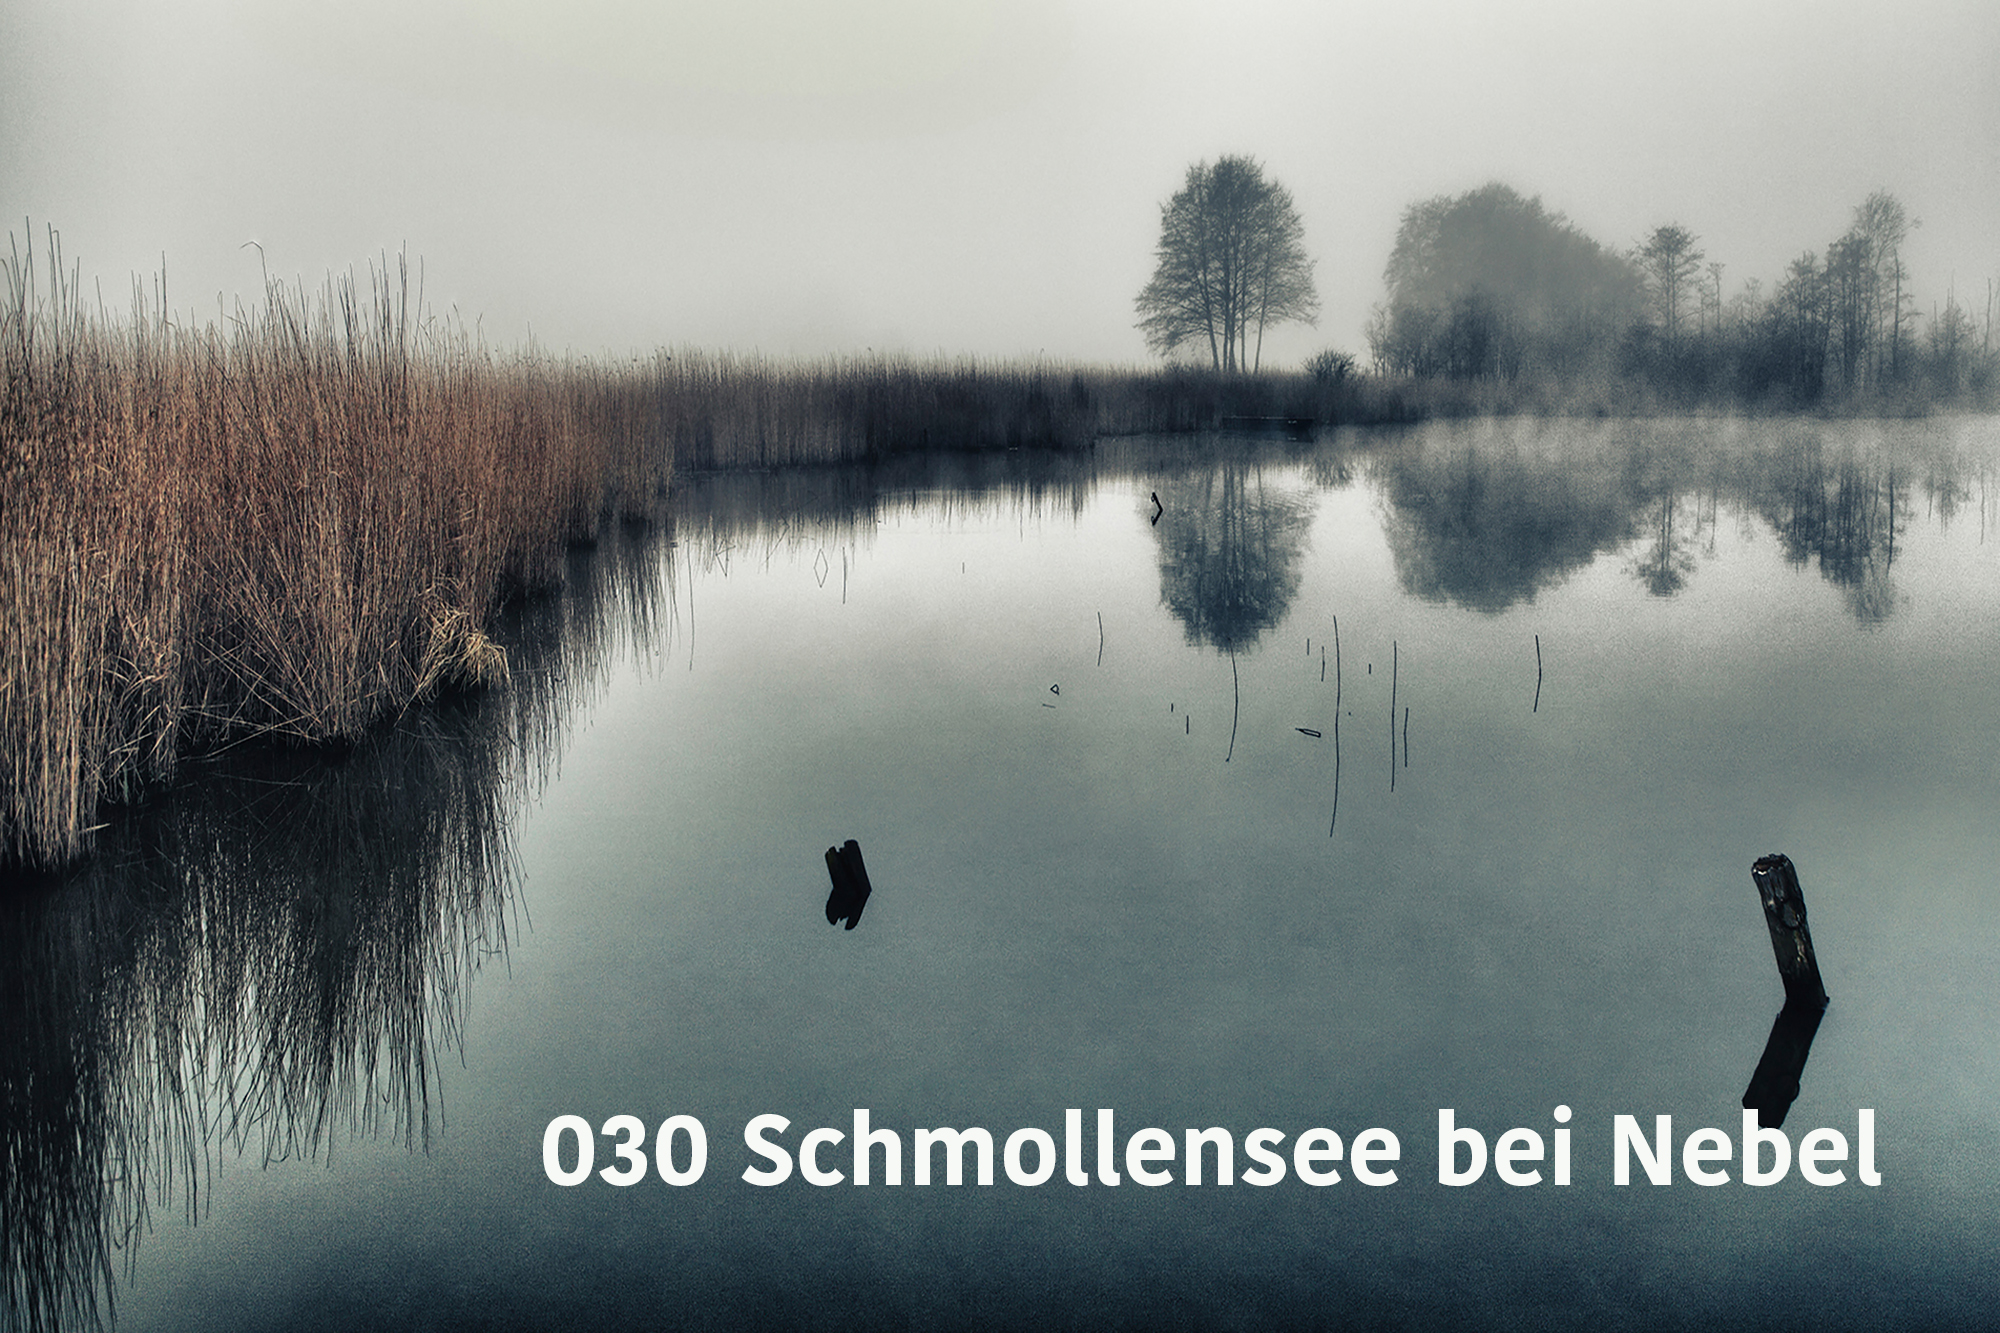 Usedom Motive (2) Canvasleinwanddruck auf Keilrahmen 100 x 150